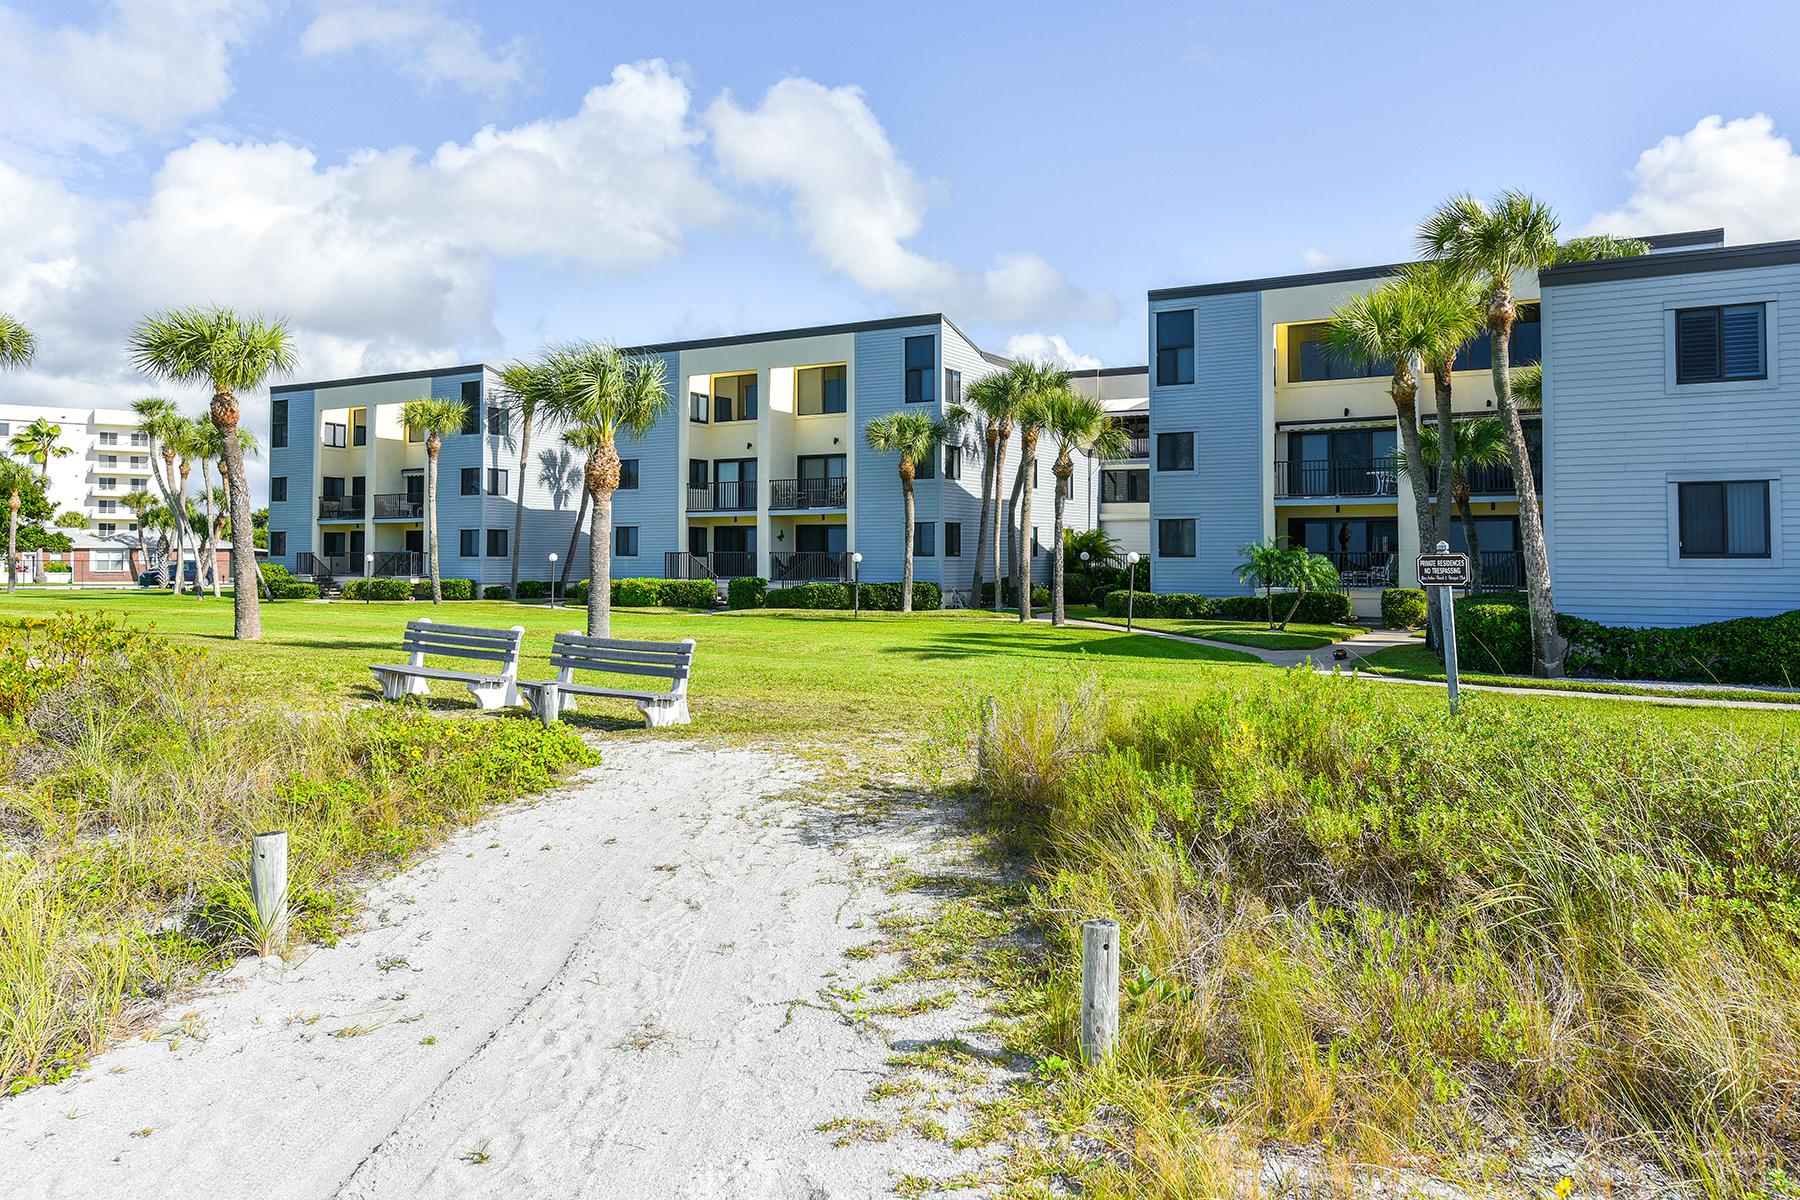 Condominium for Sale at MACARTHUR BEACH - VENICE ISLAND 700 Golden Beach Blvd 108 Venice, Florida 34285 United States